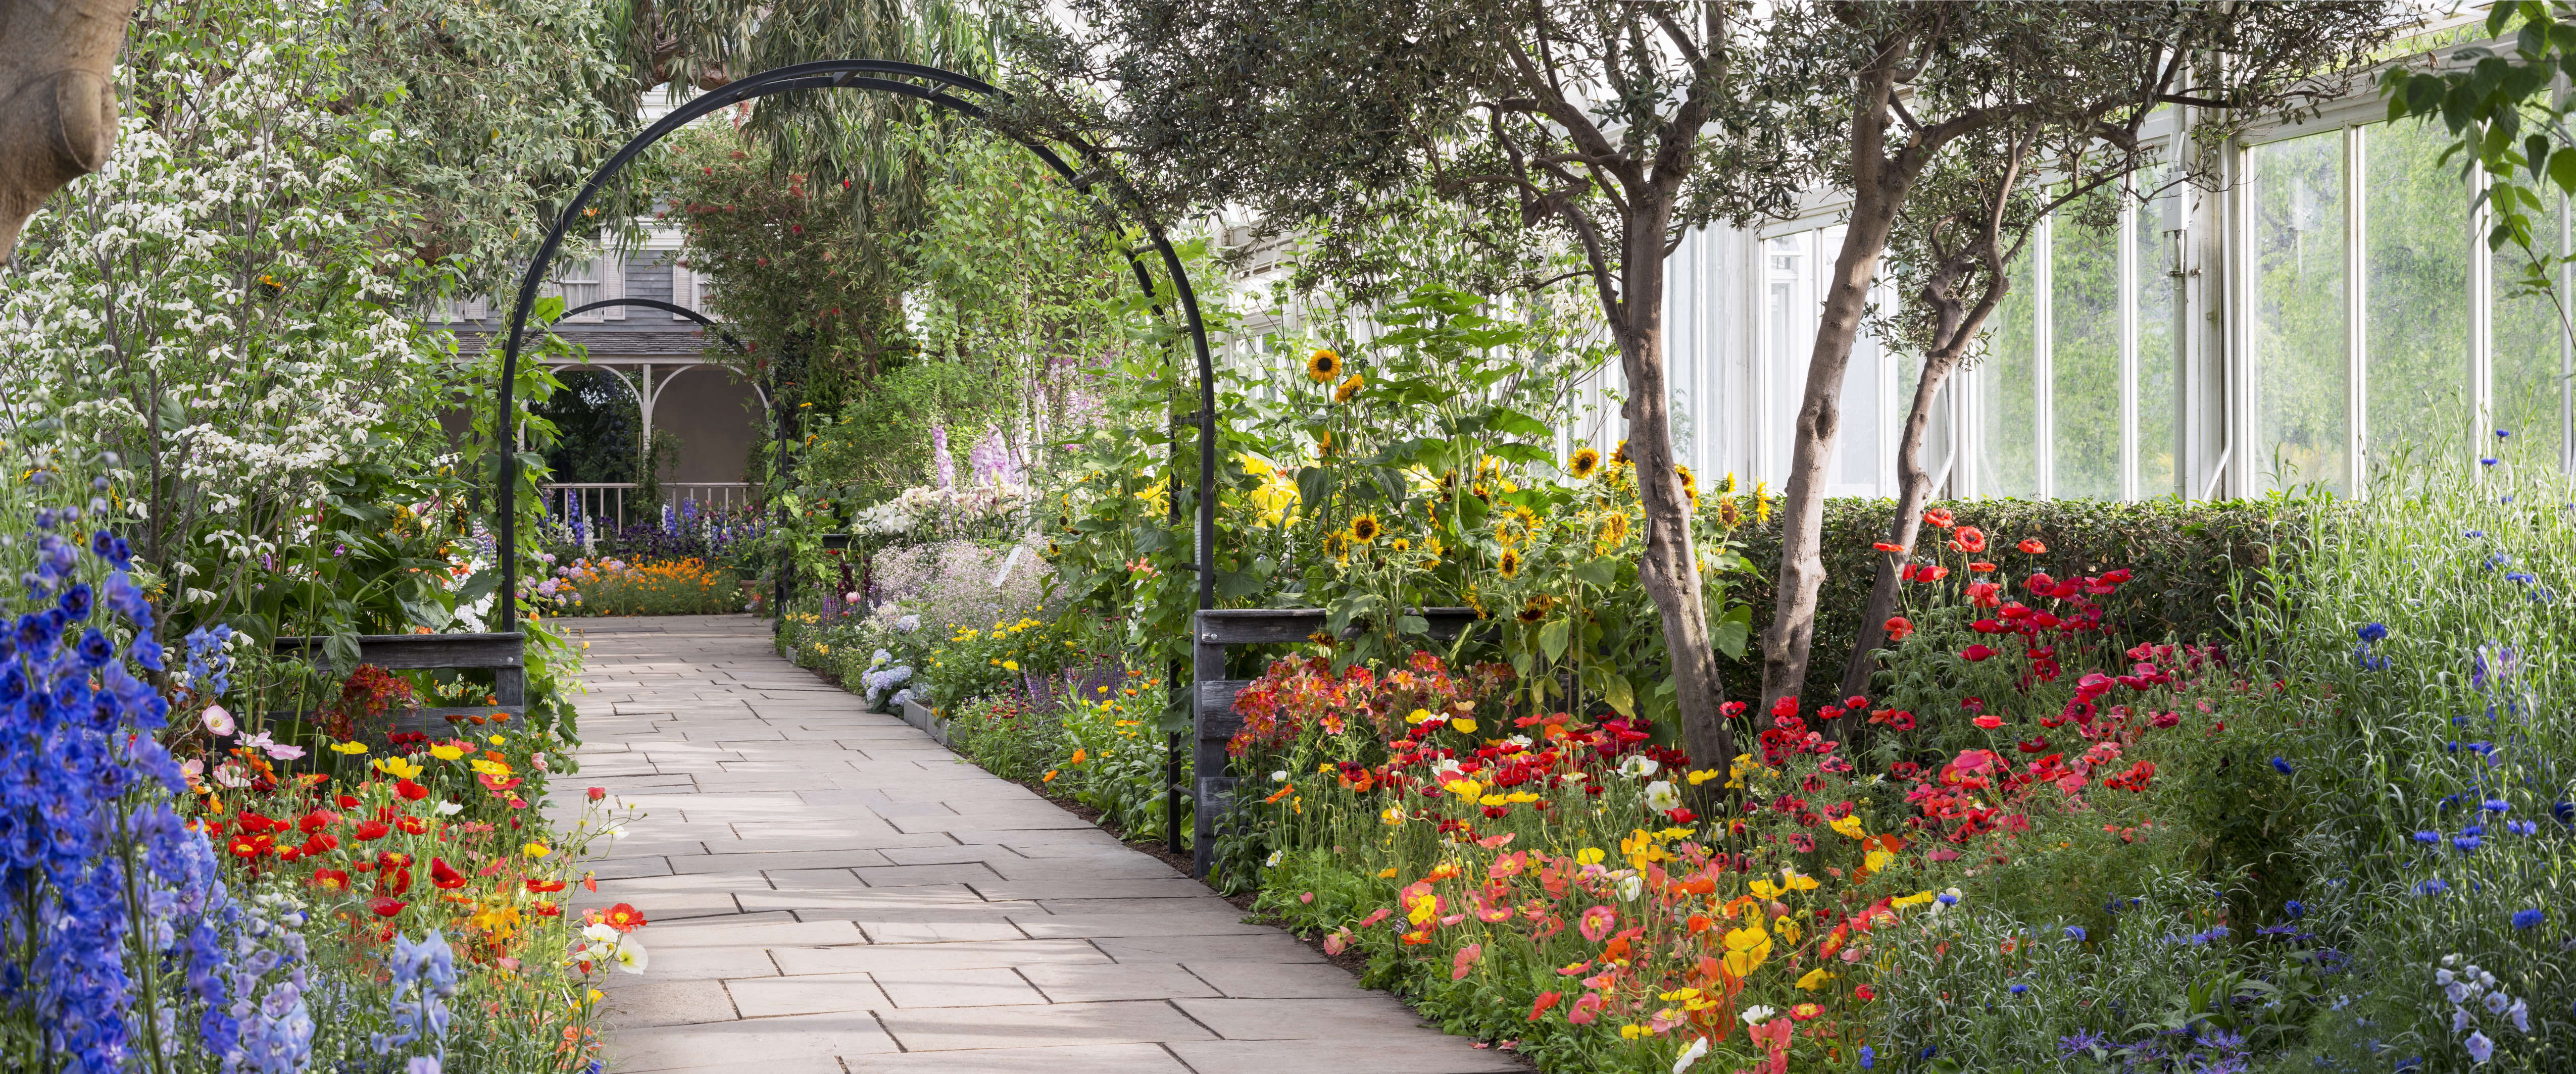 visit to a botanical garden